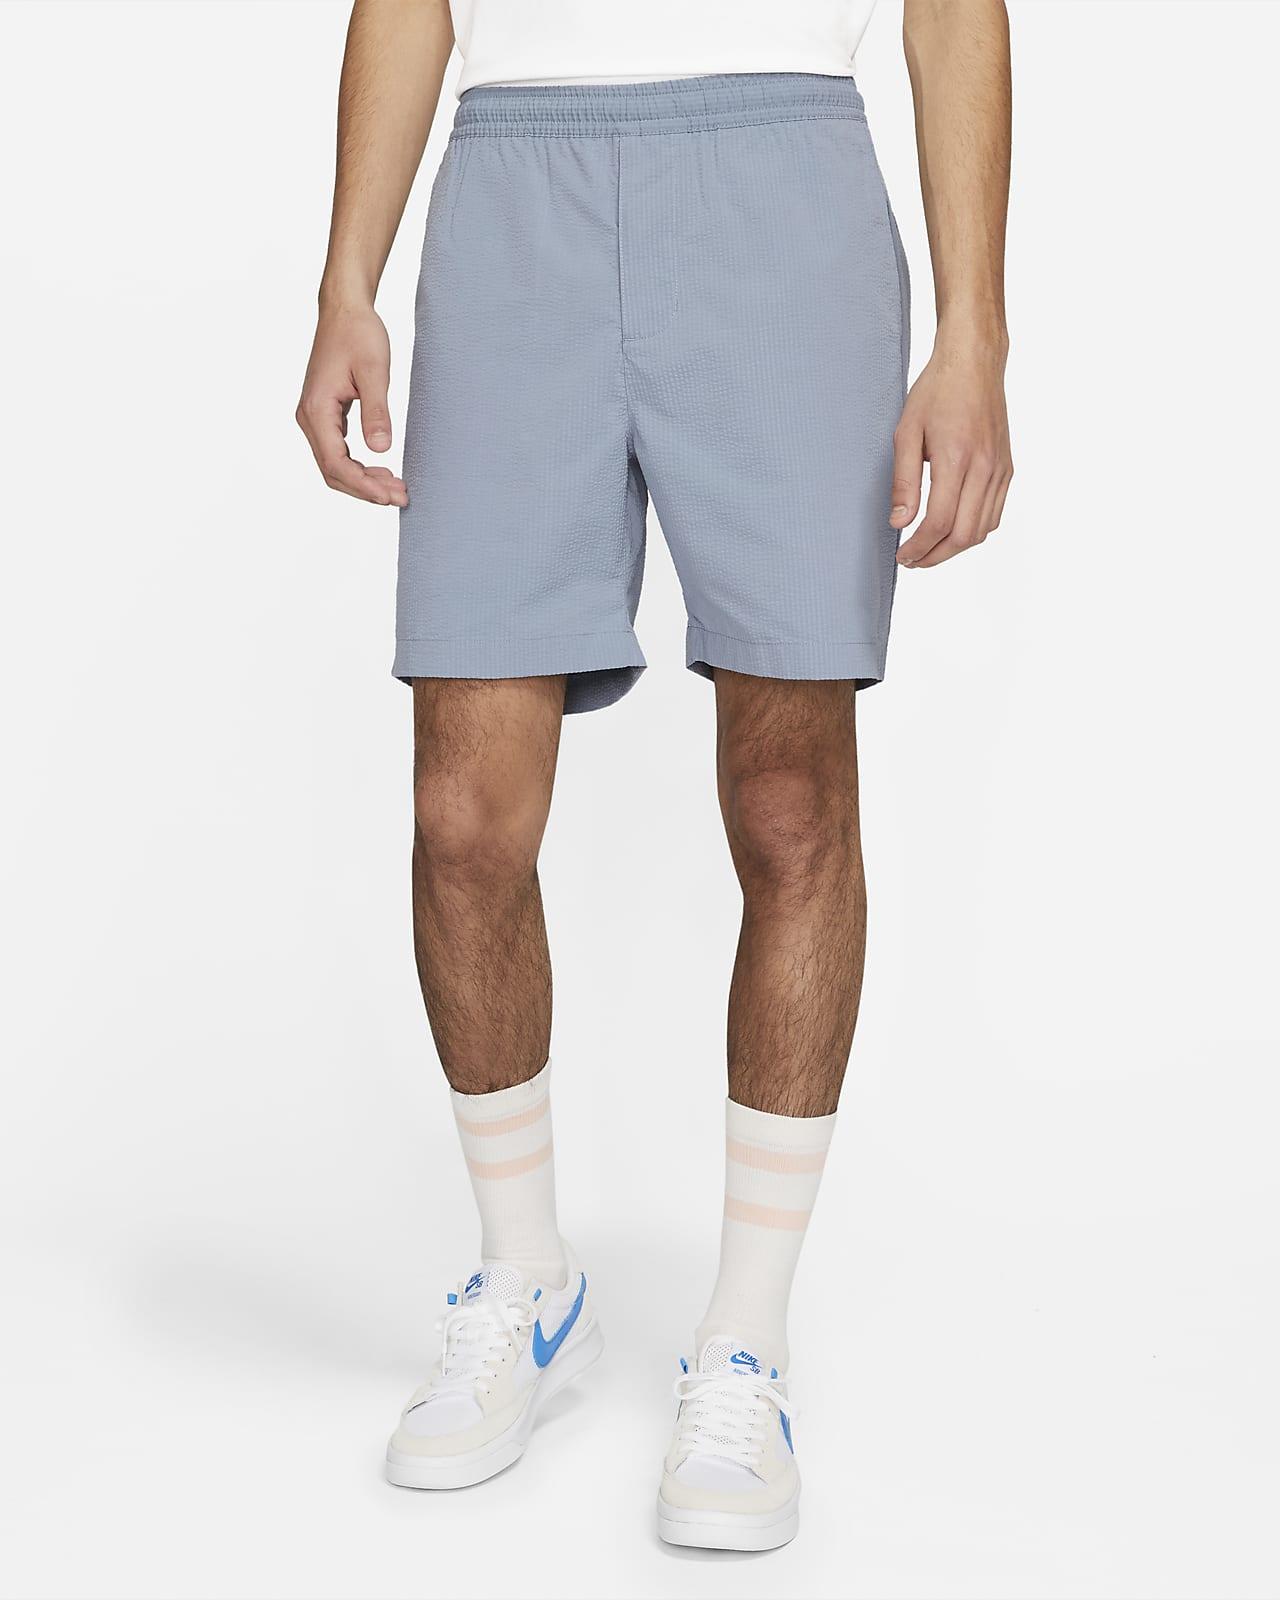 Nike SB Pull-On Chino 男子滑板短裤